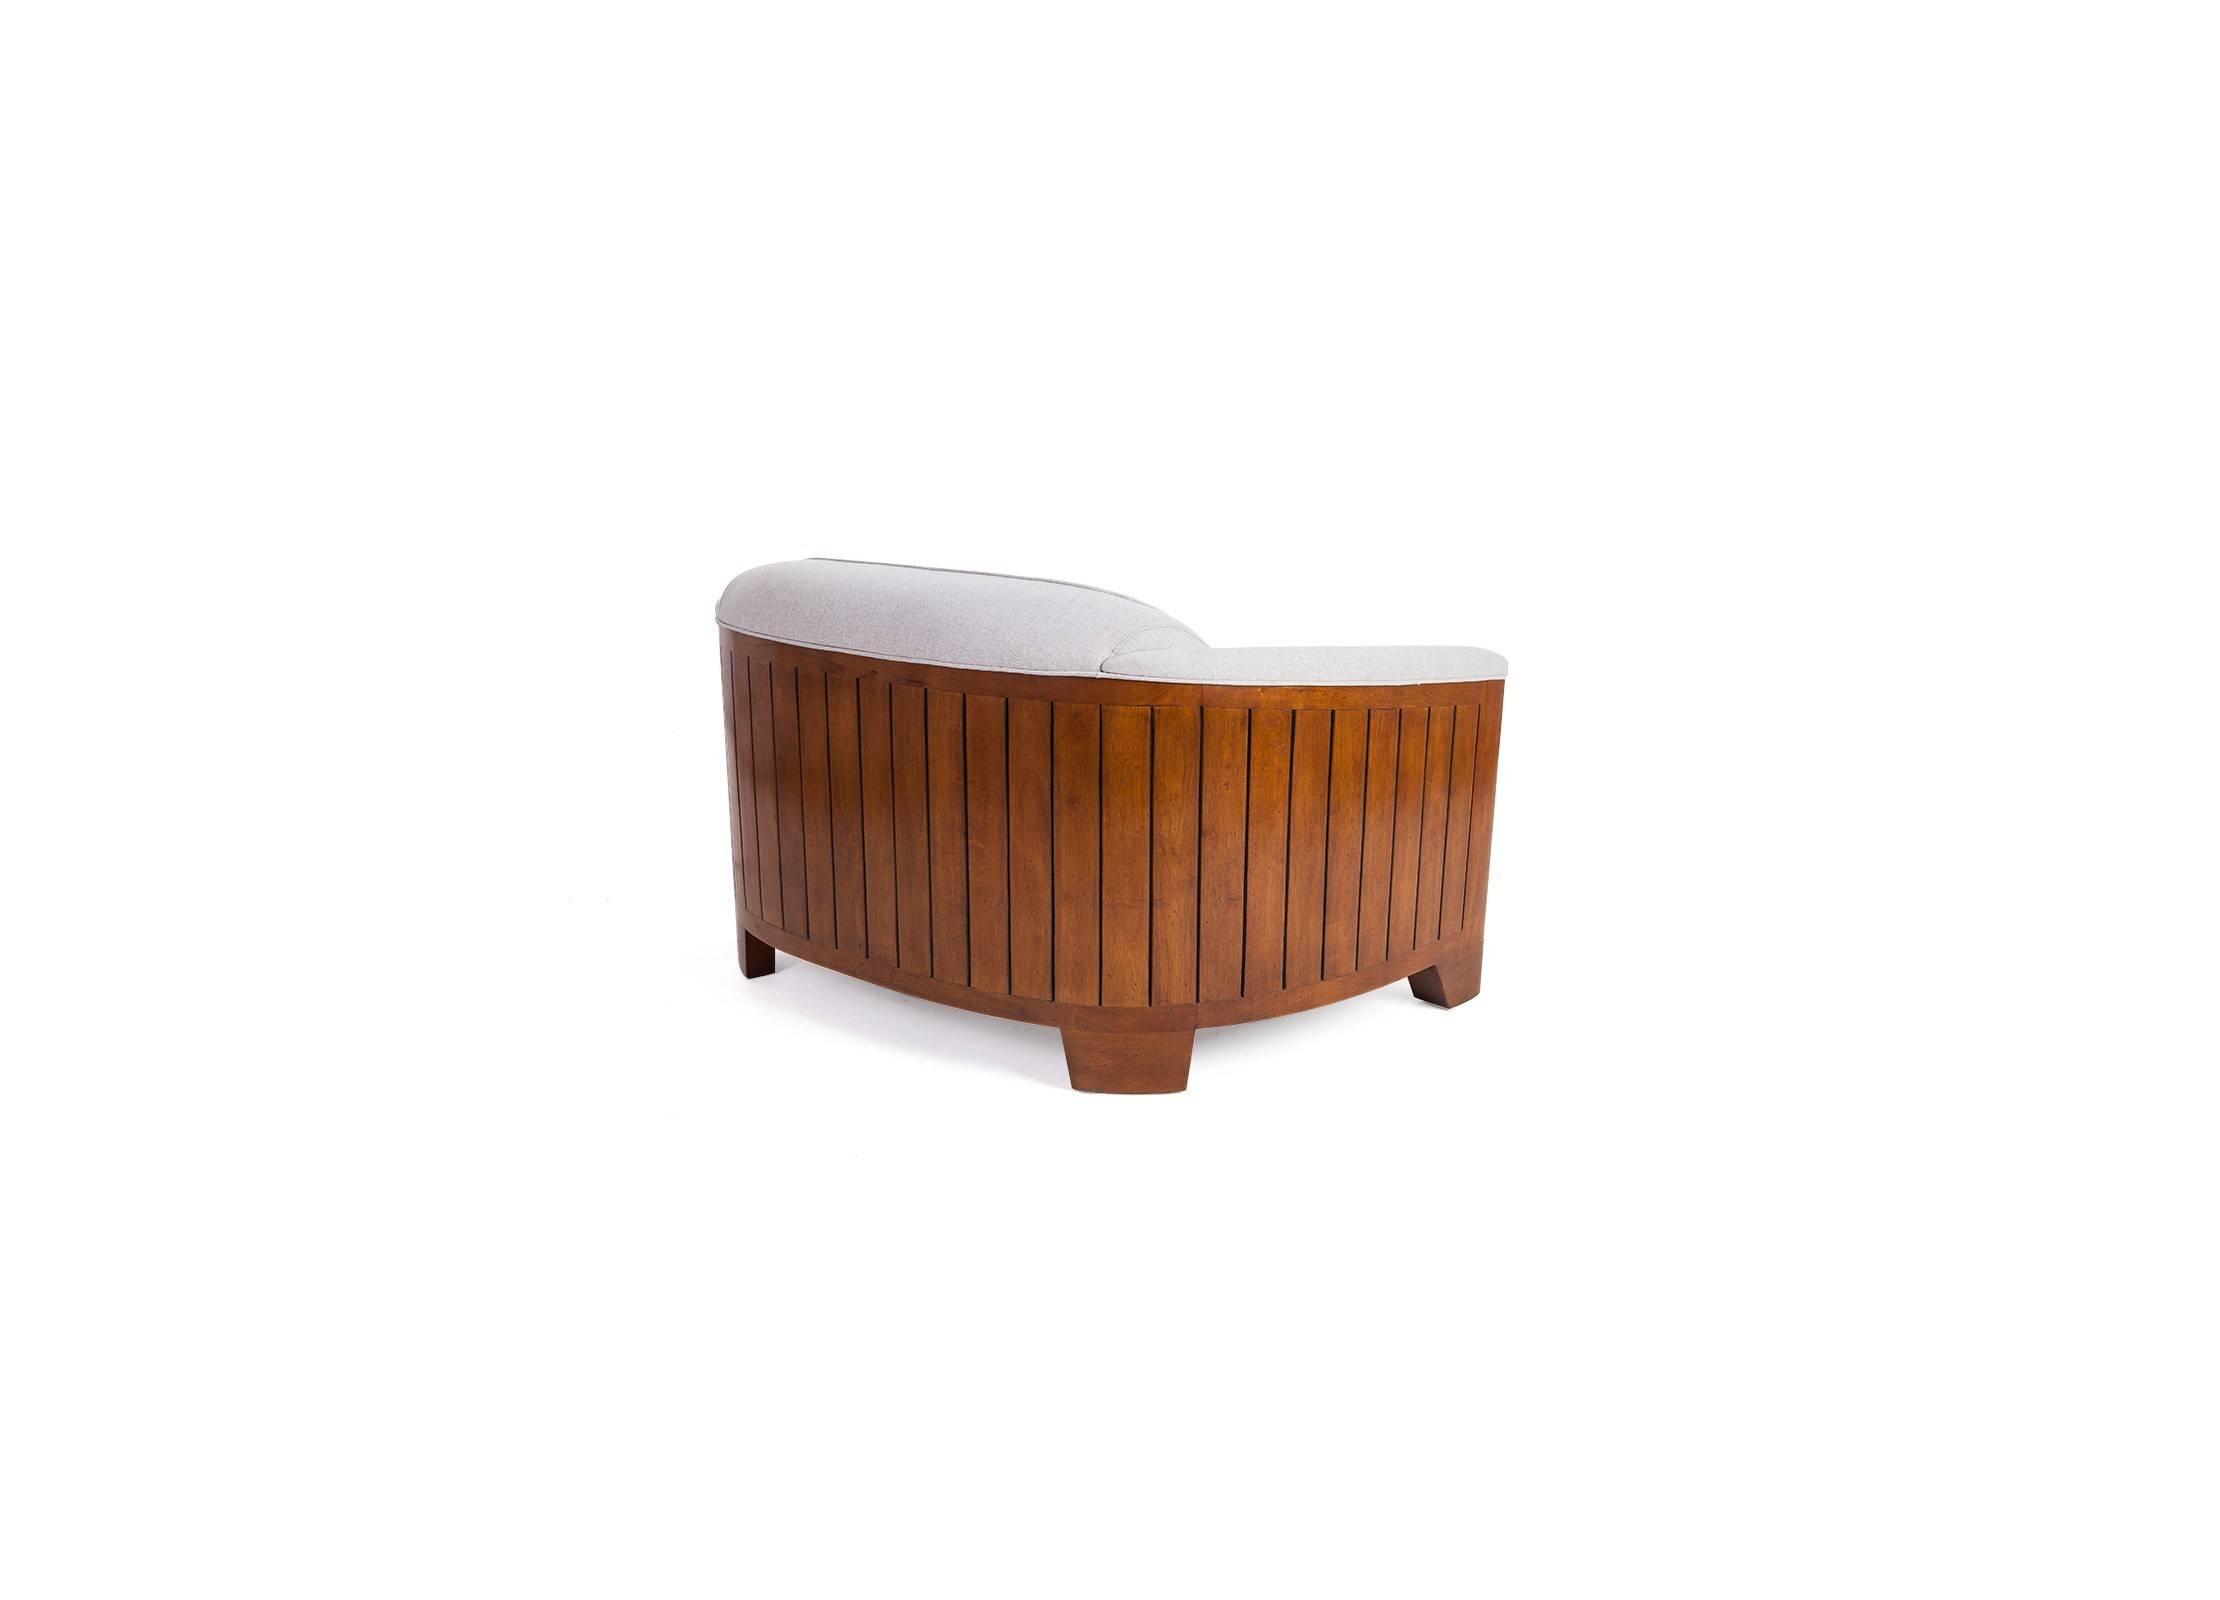 canap club cano beige 2 3 places bois et tissu. Black Bedroom Furniture Sets. Home Design Ideas